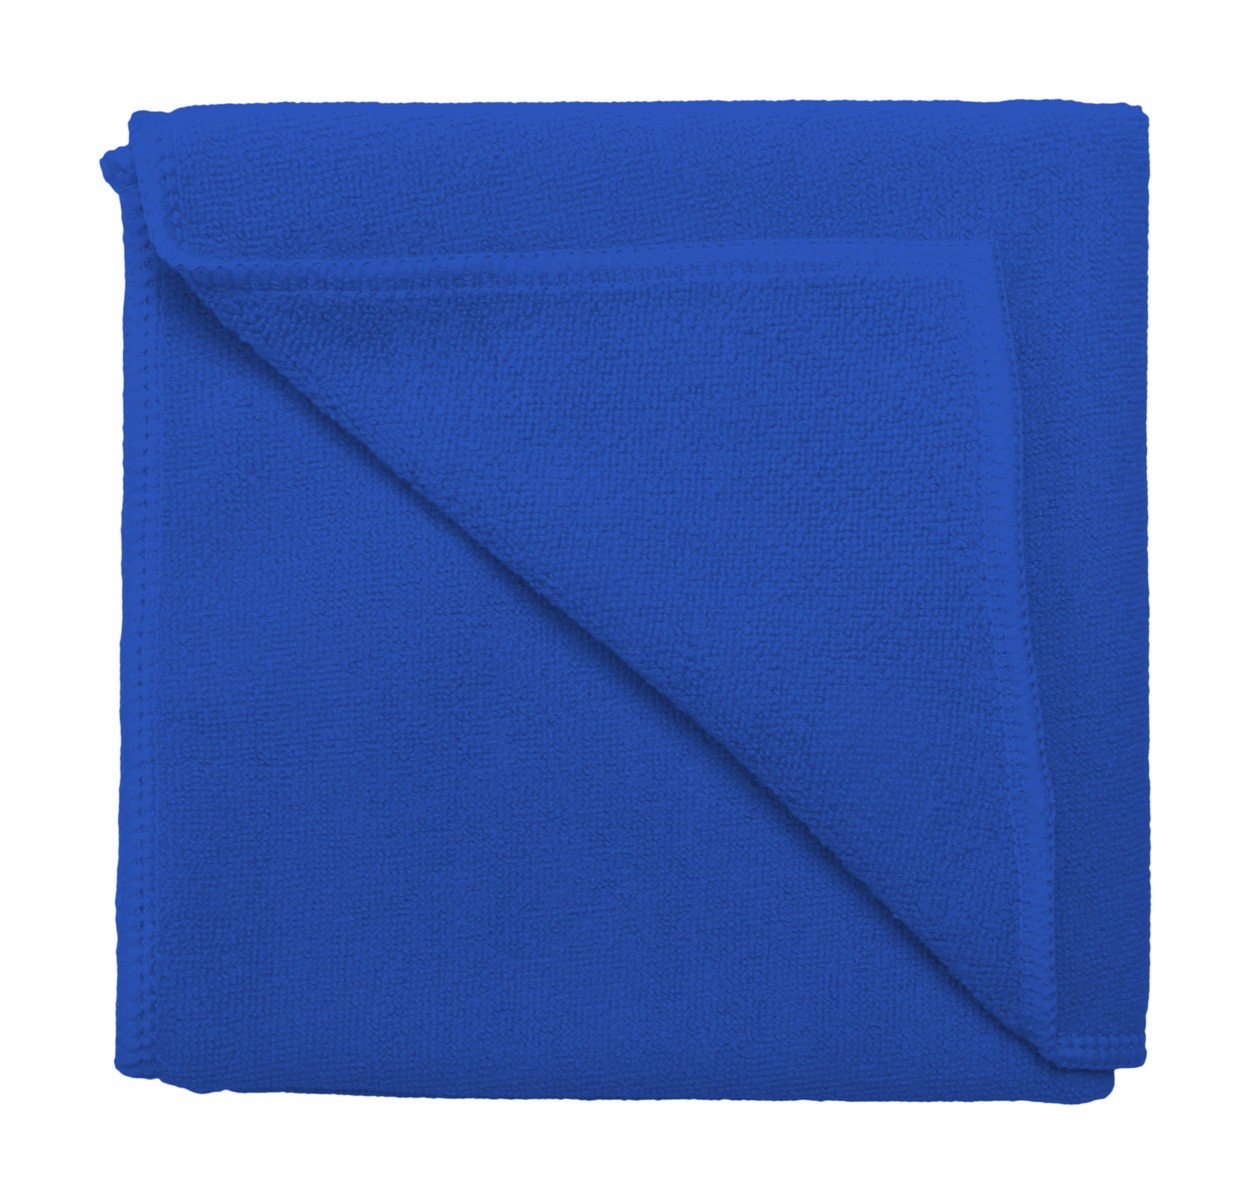 Prosop Kotto - Albastru